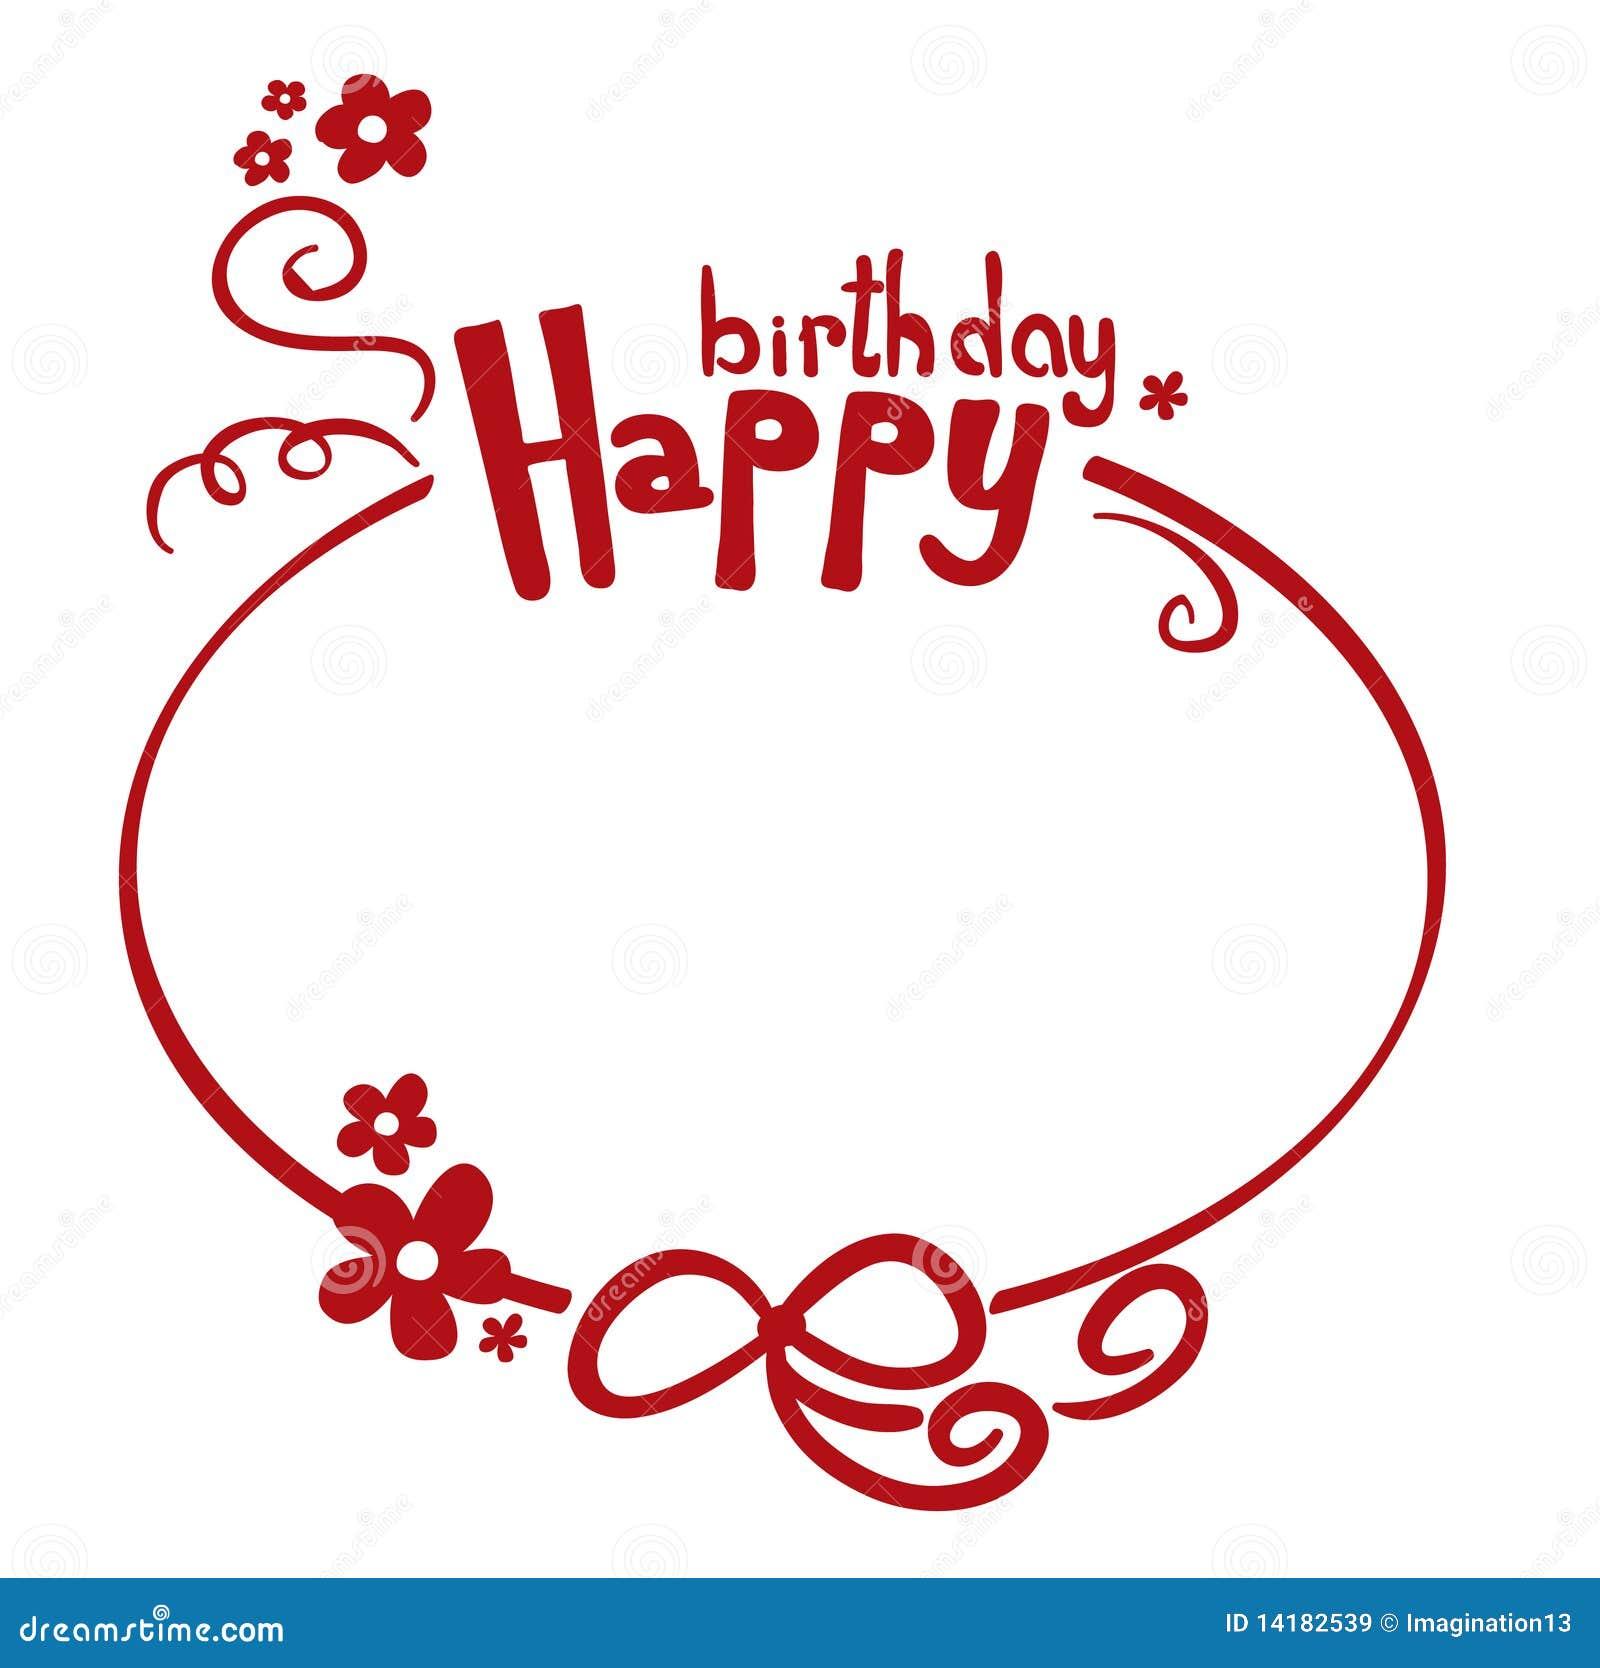 Birthday Border Royalty Free Stock Images - Image: 14182539